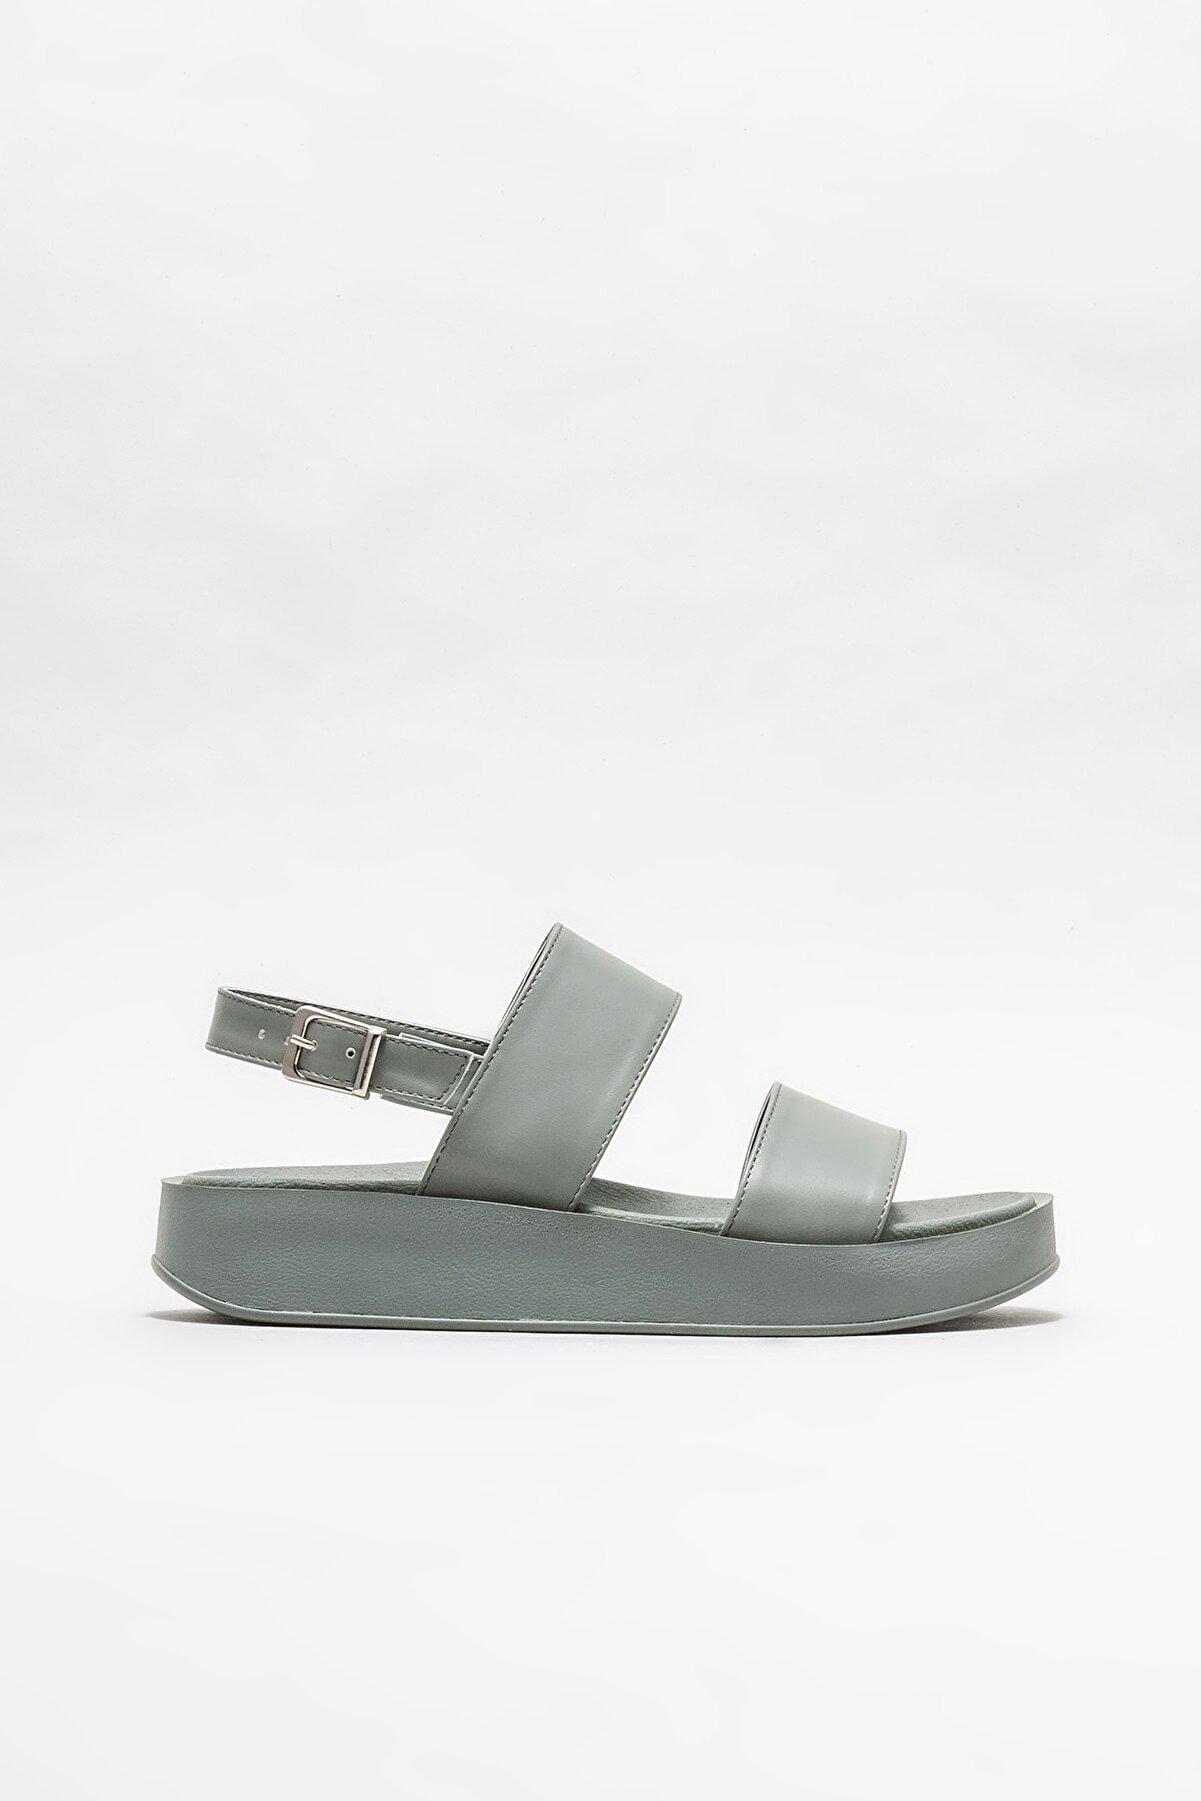 Elle Gri Kadın Dolgu Topuklu Sandalet